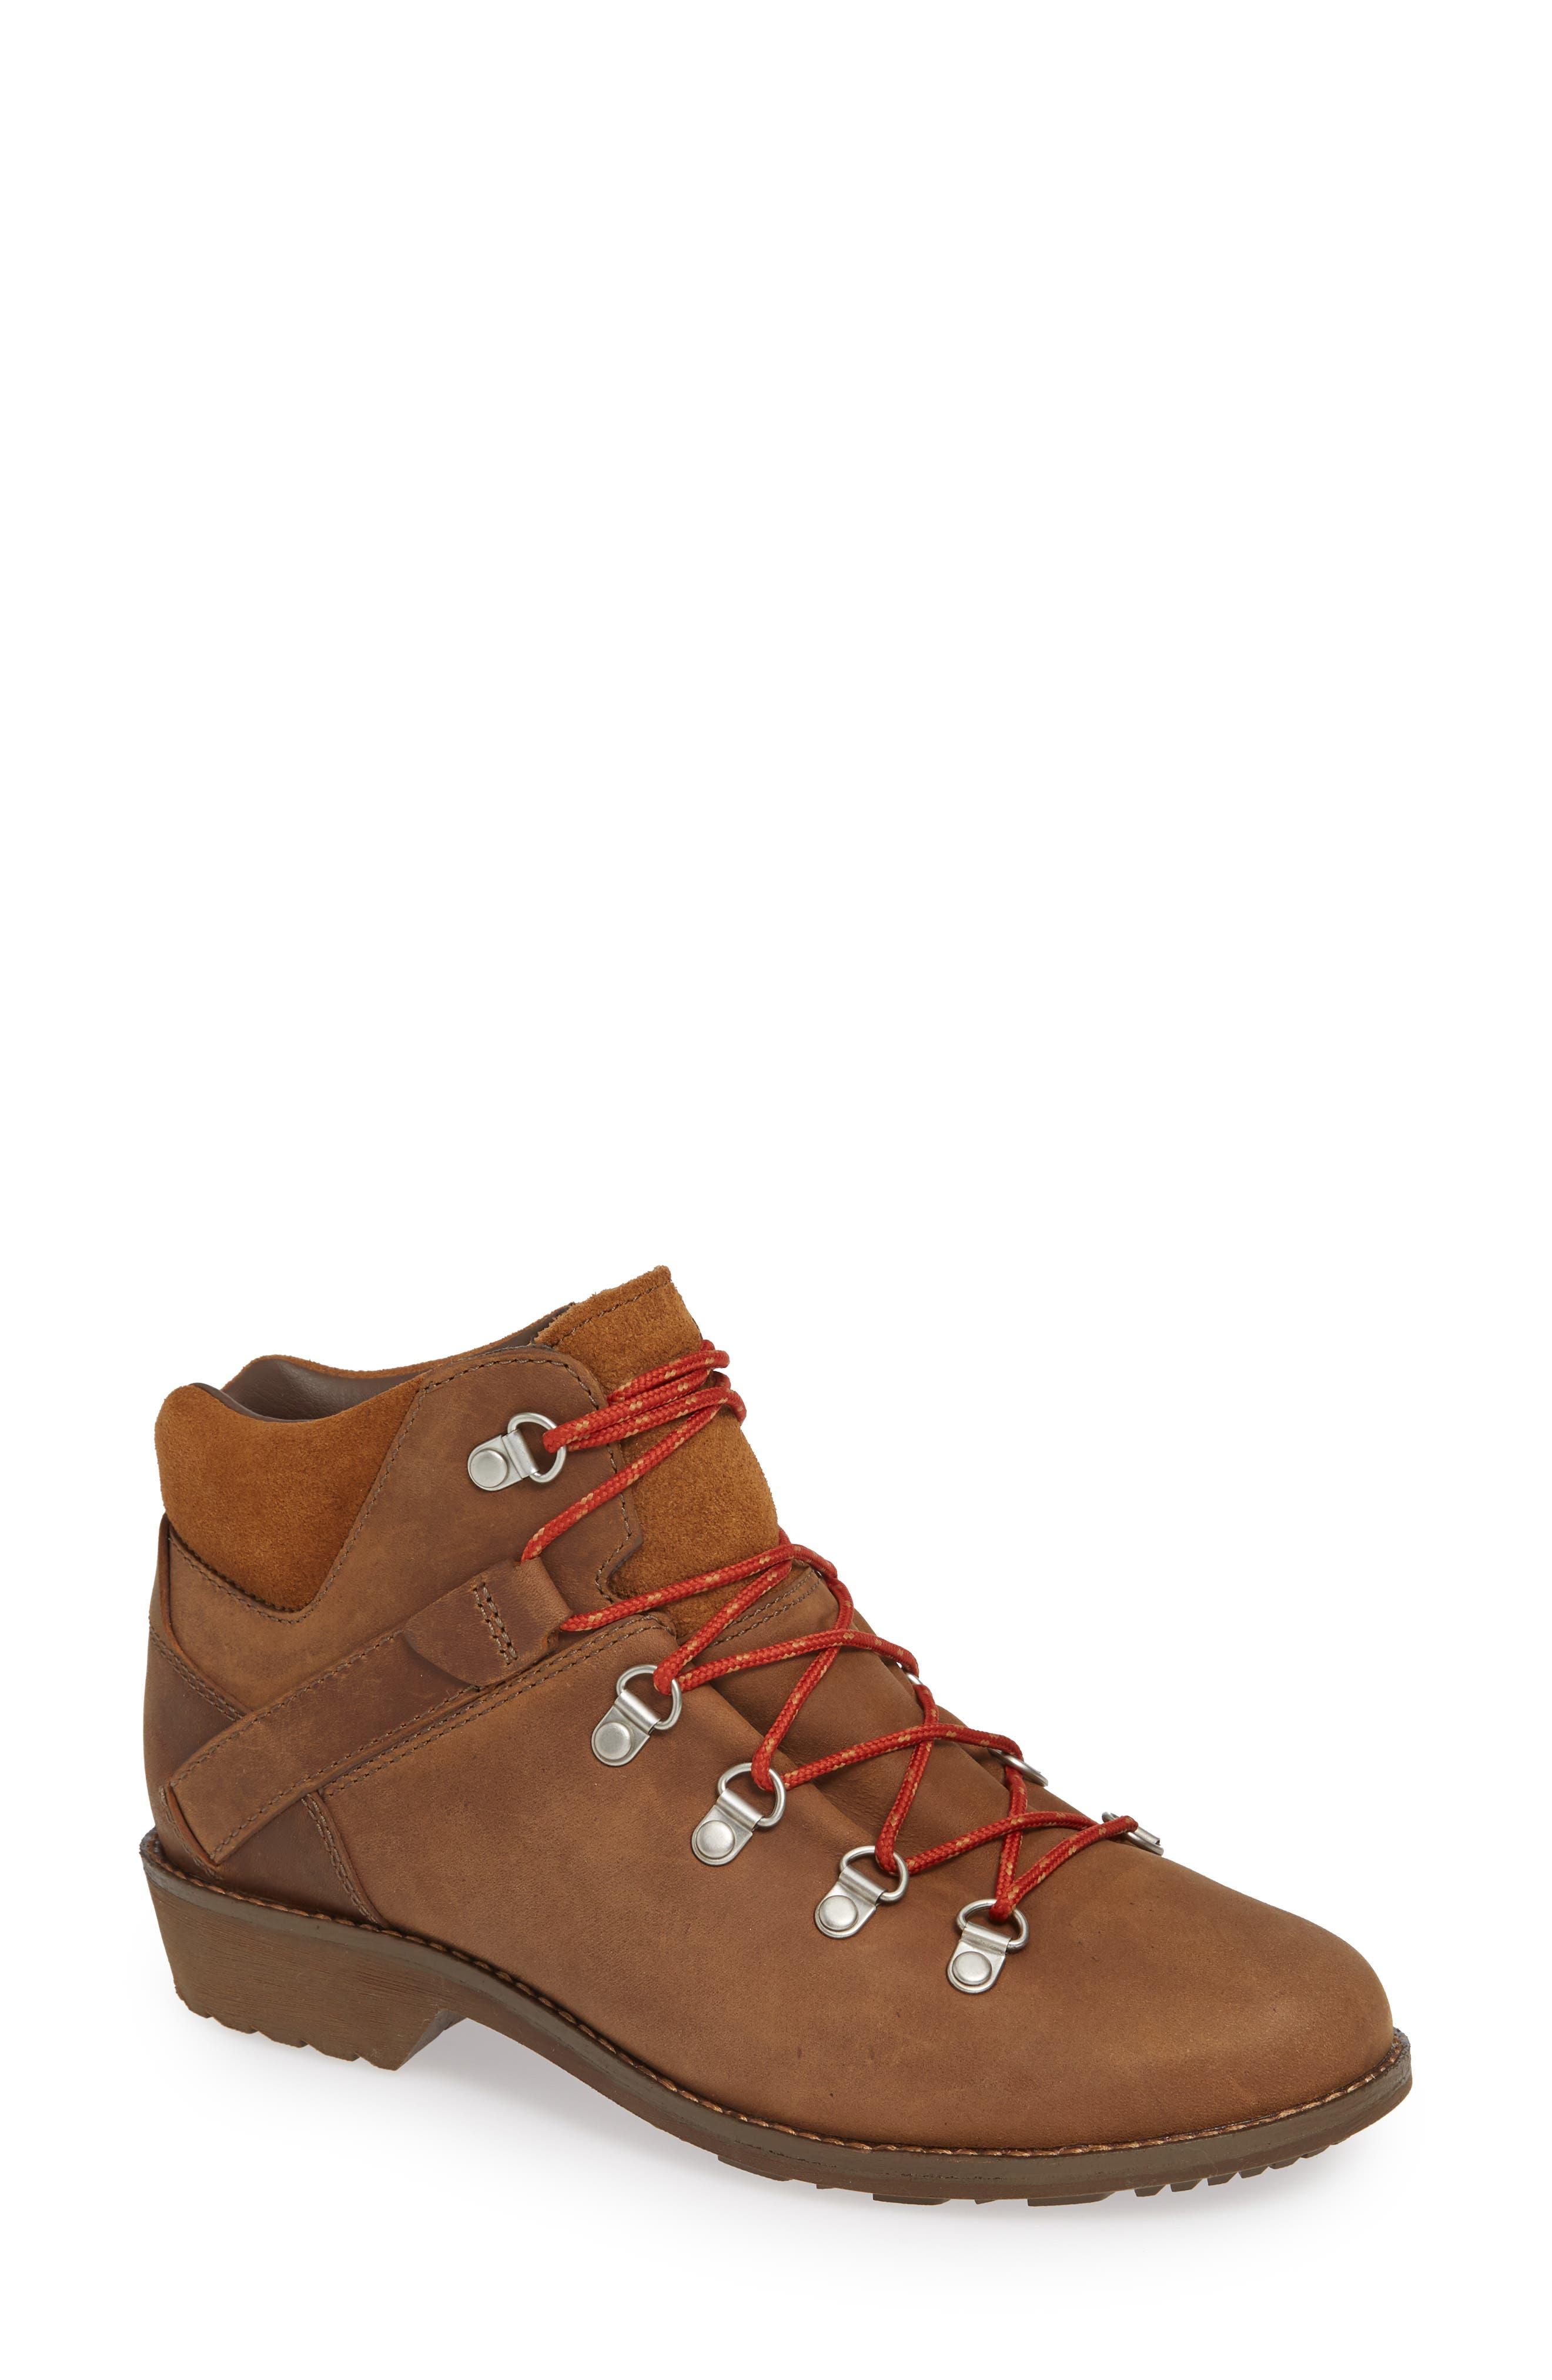 De La Vina Dos Alpine Waterproof Low Boot,                             Main thumbnail 1, color,                             PECAN LEATHER